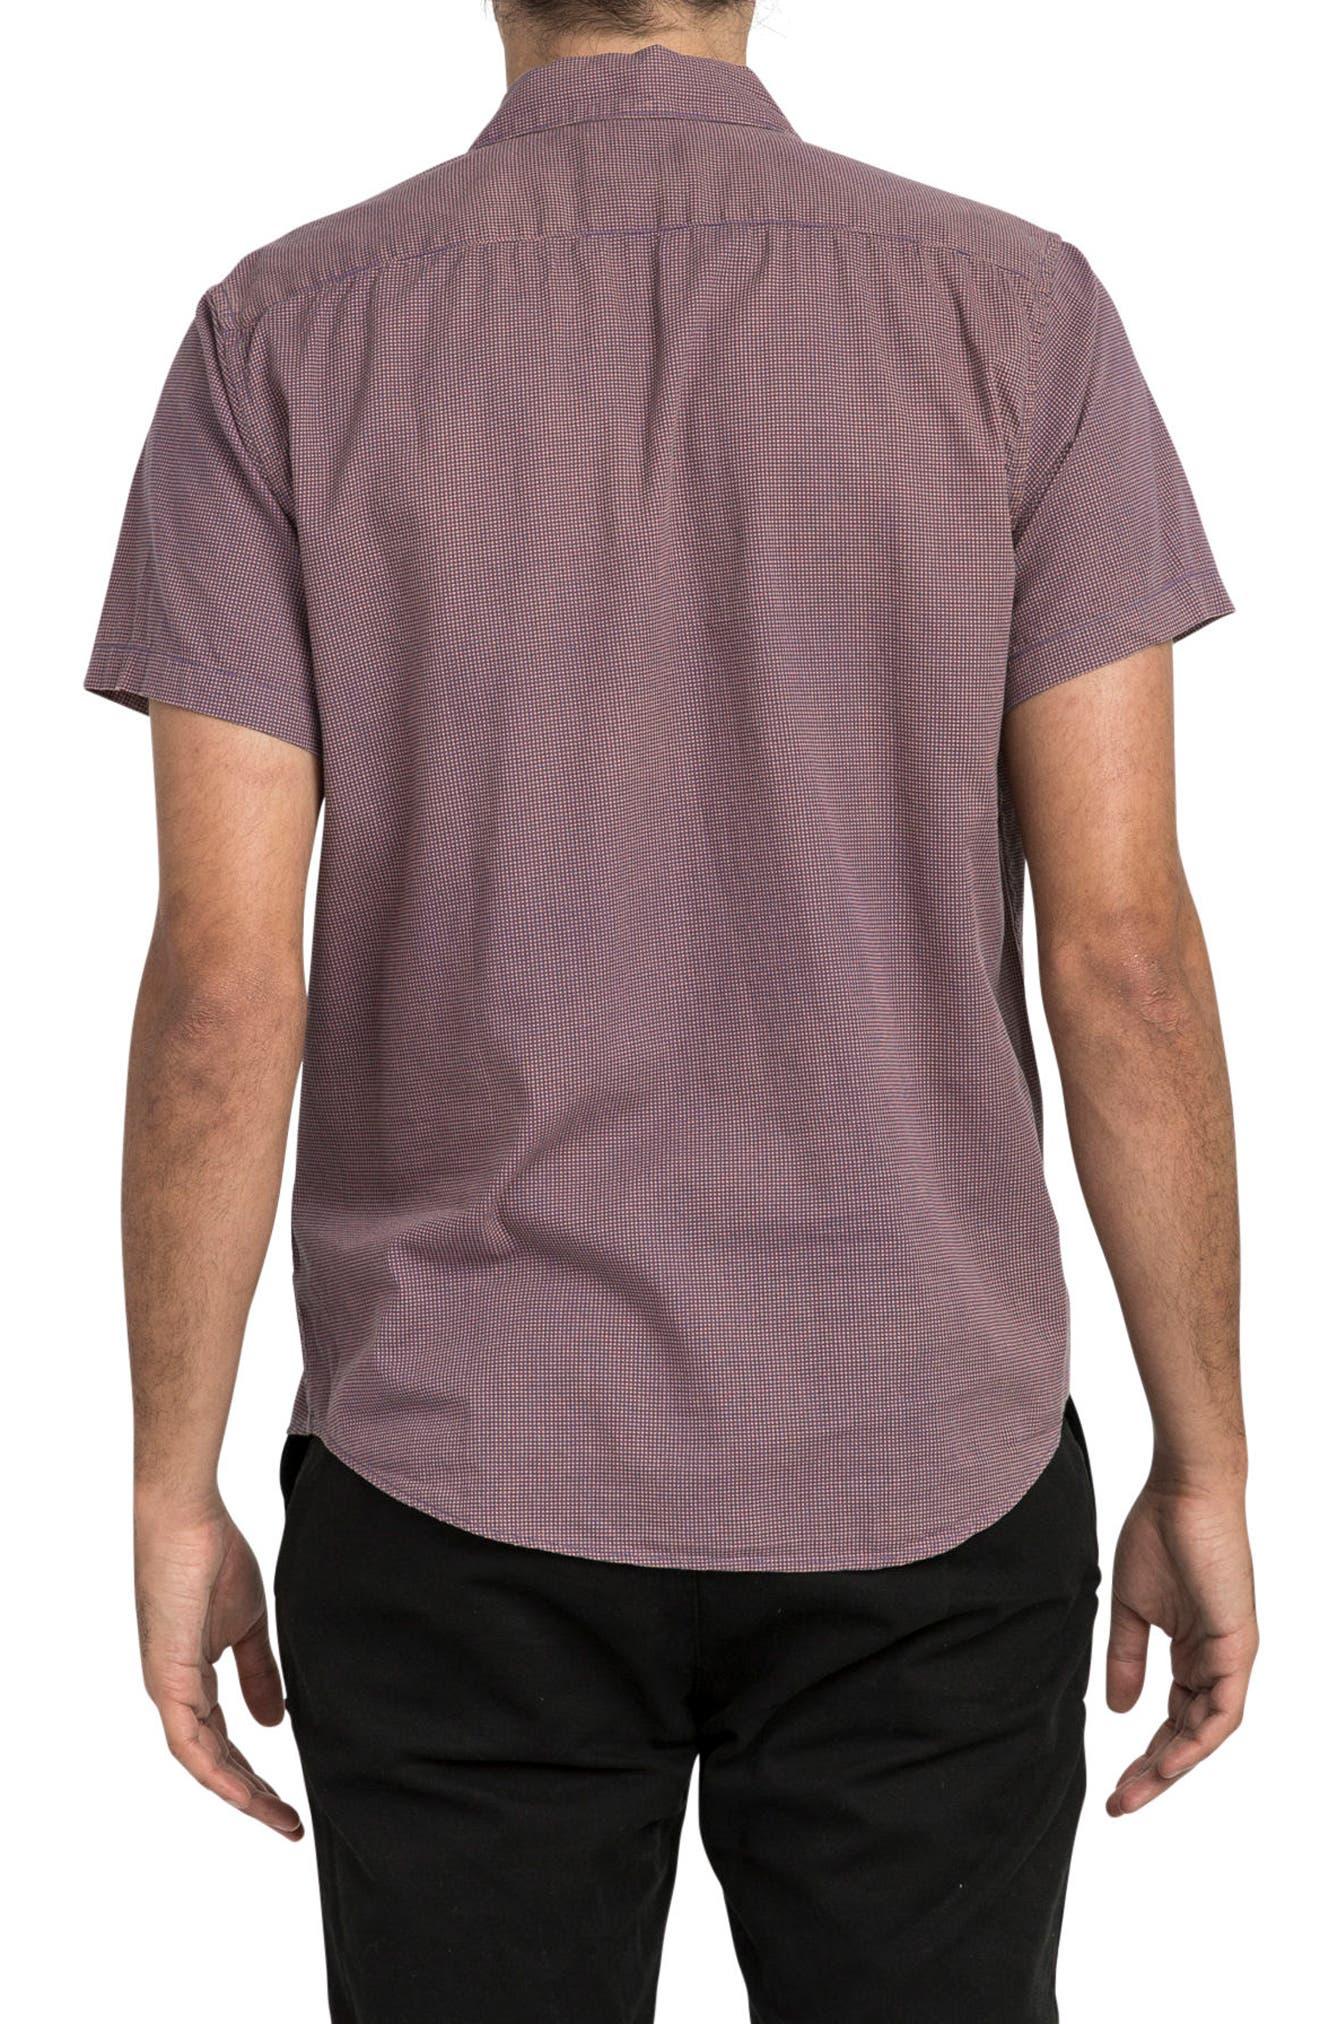 No Name Woven Shirt,                             Alternate thumbnail 2, color,                             600